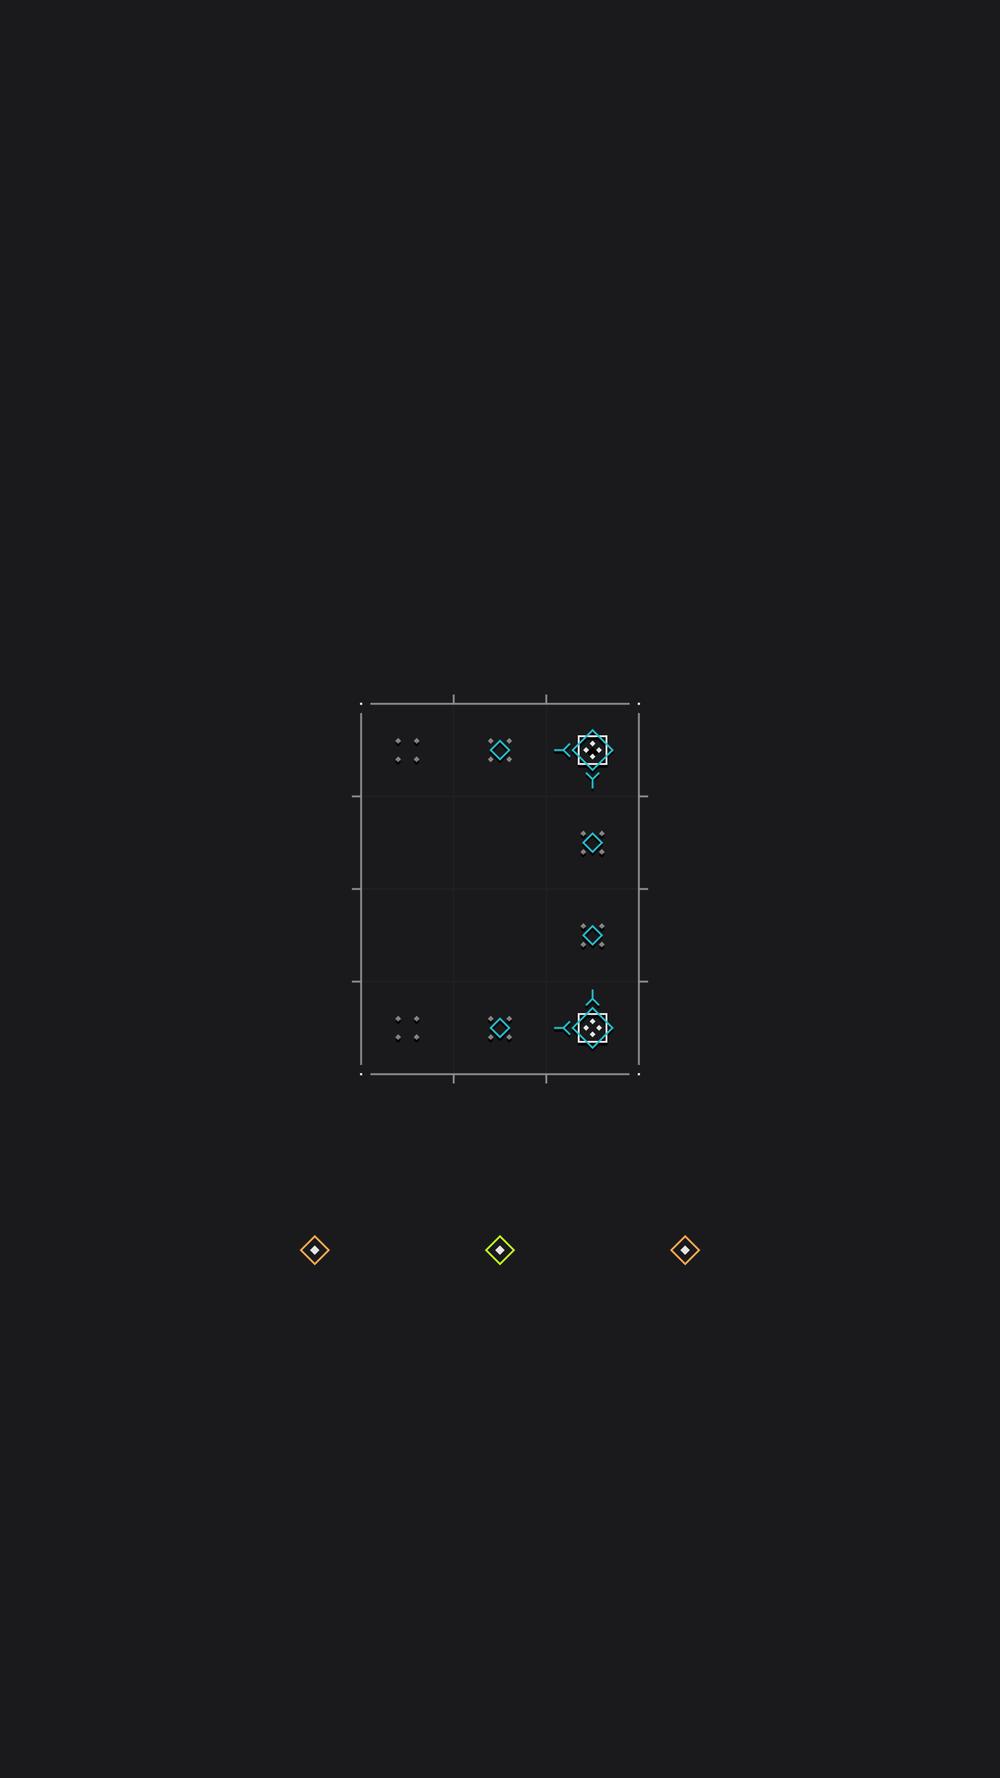 puzzle-depth-20.png